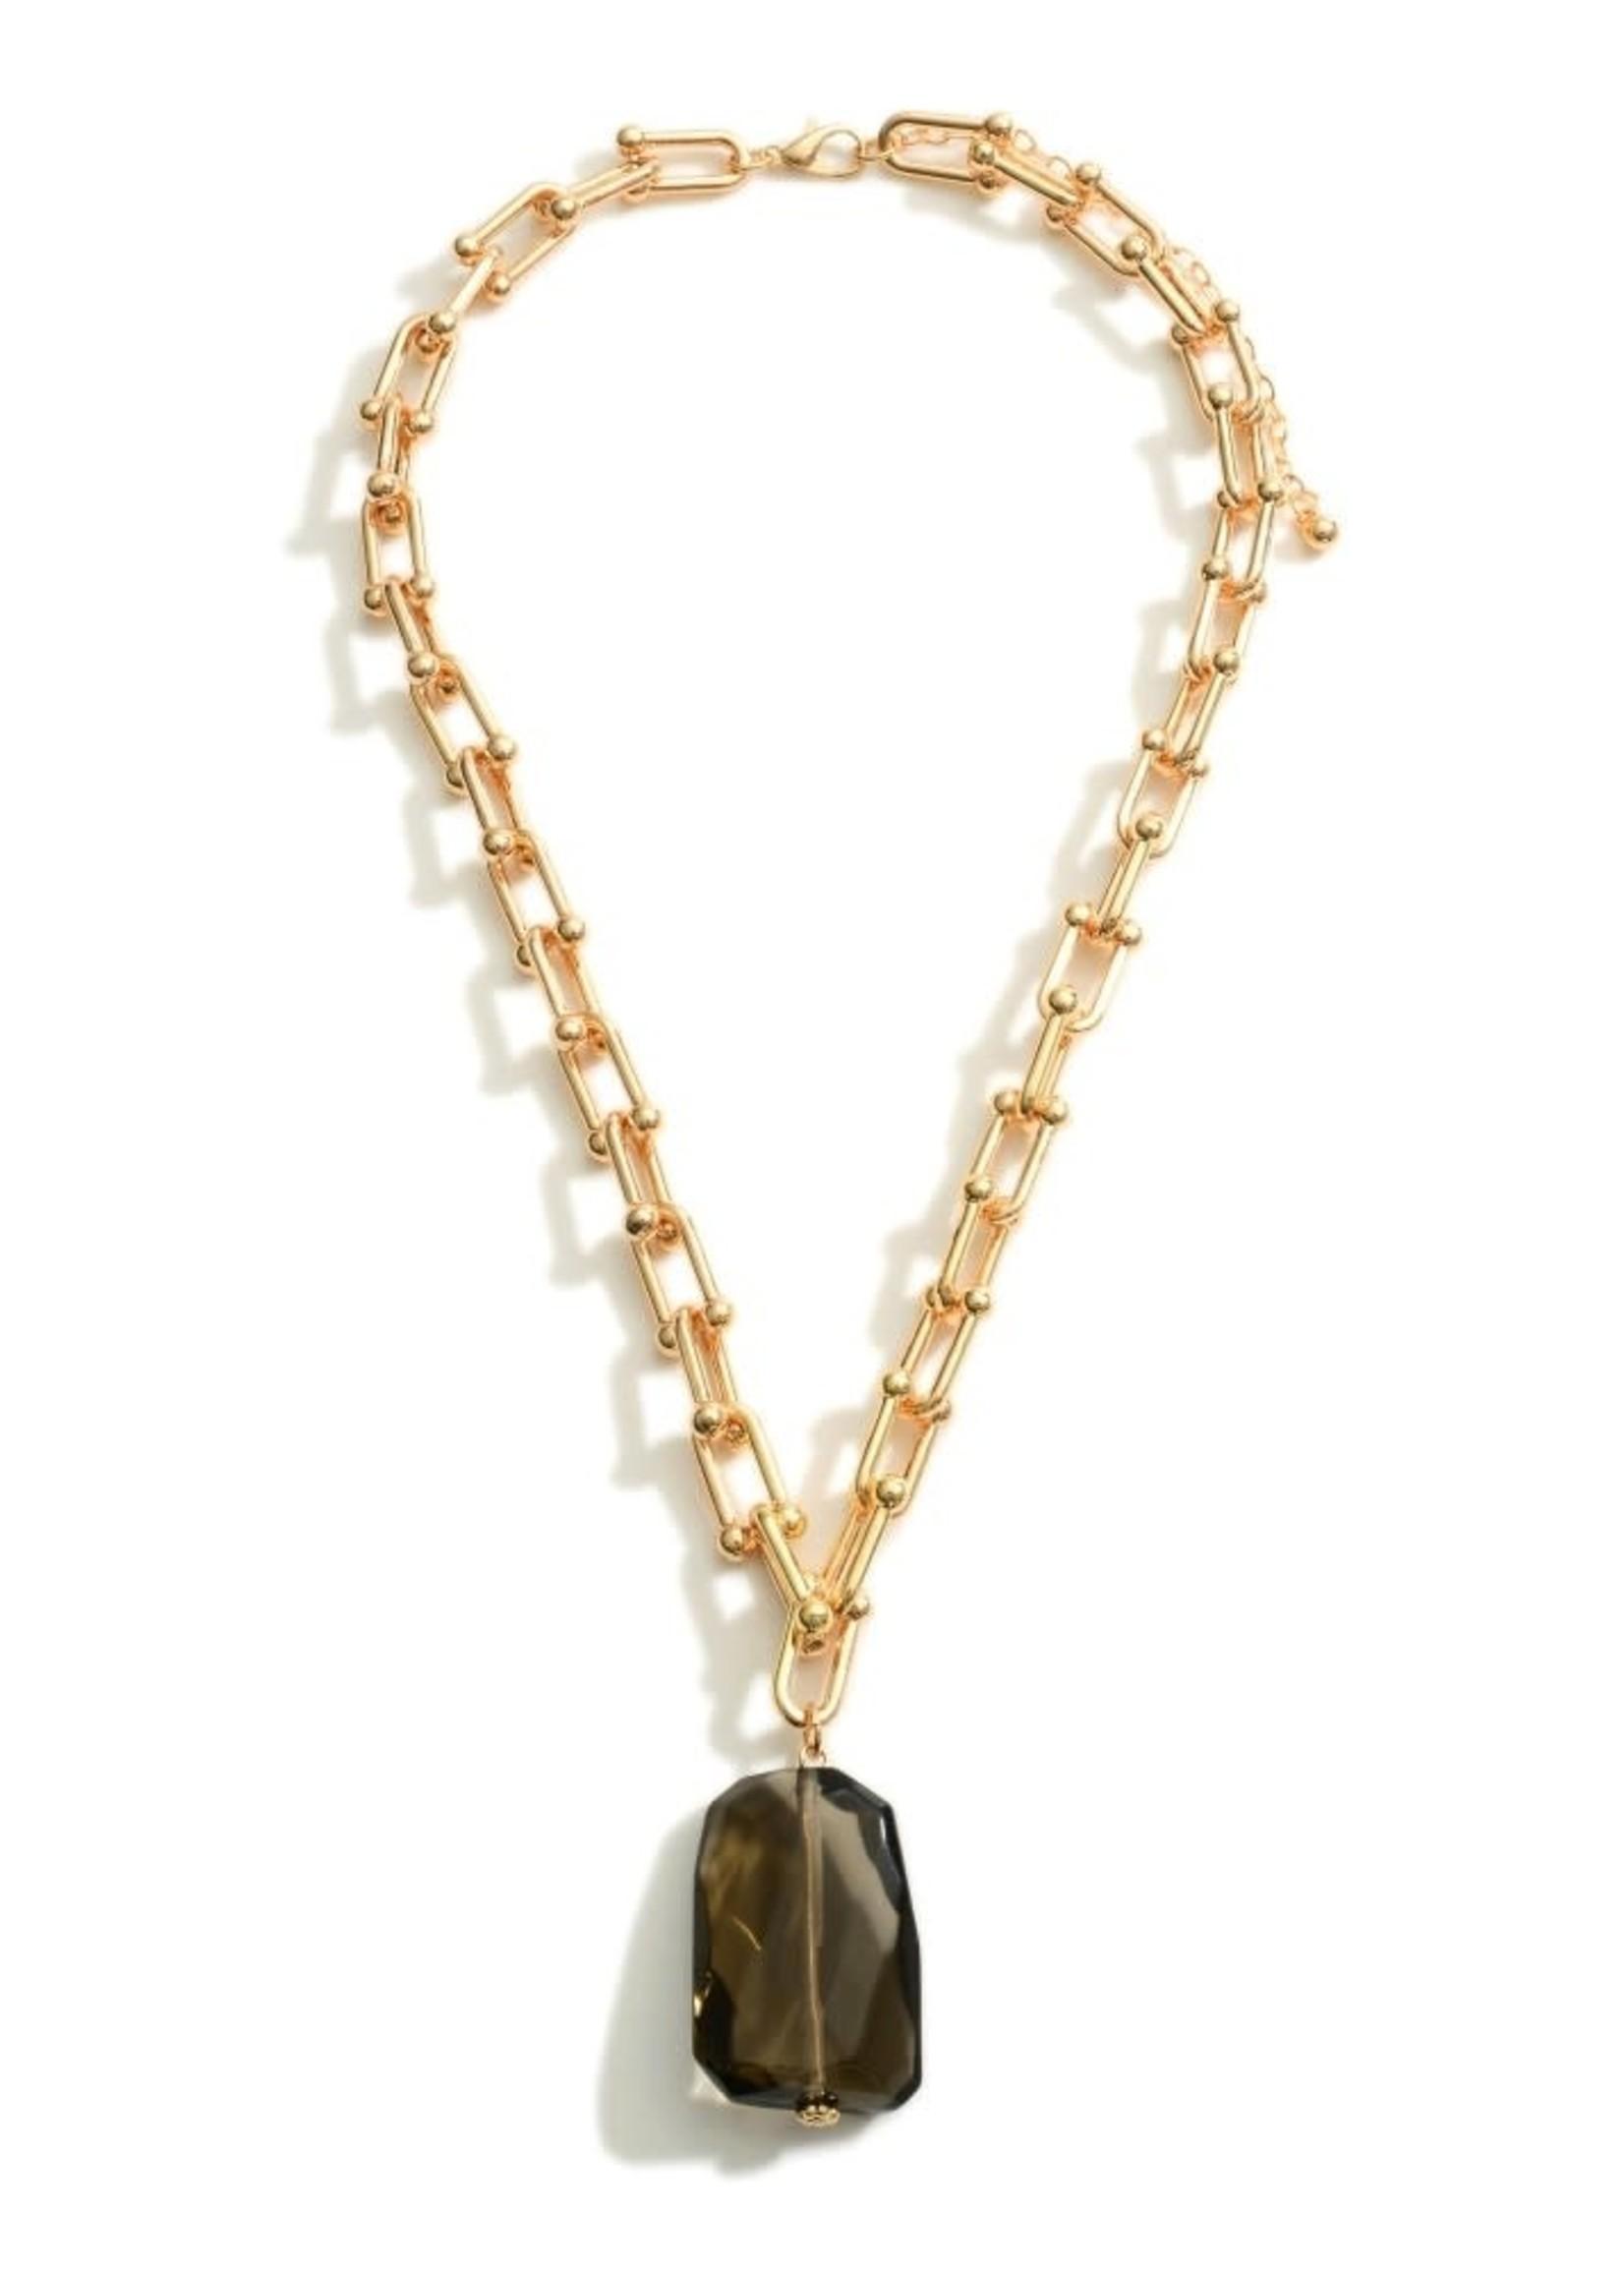 Smokey Quartz Chain Link Necklace